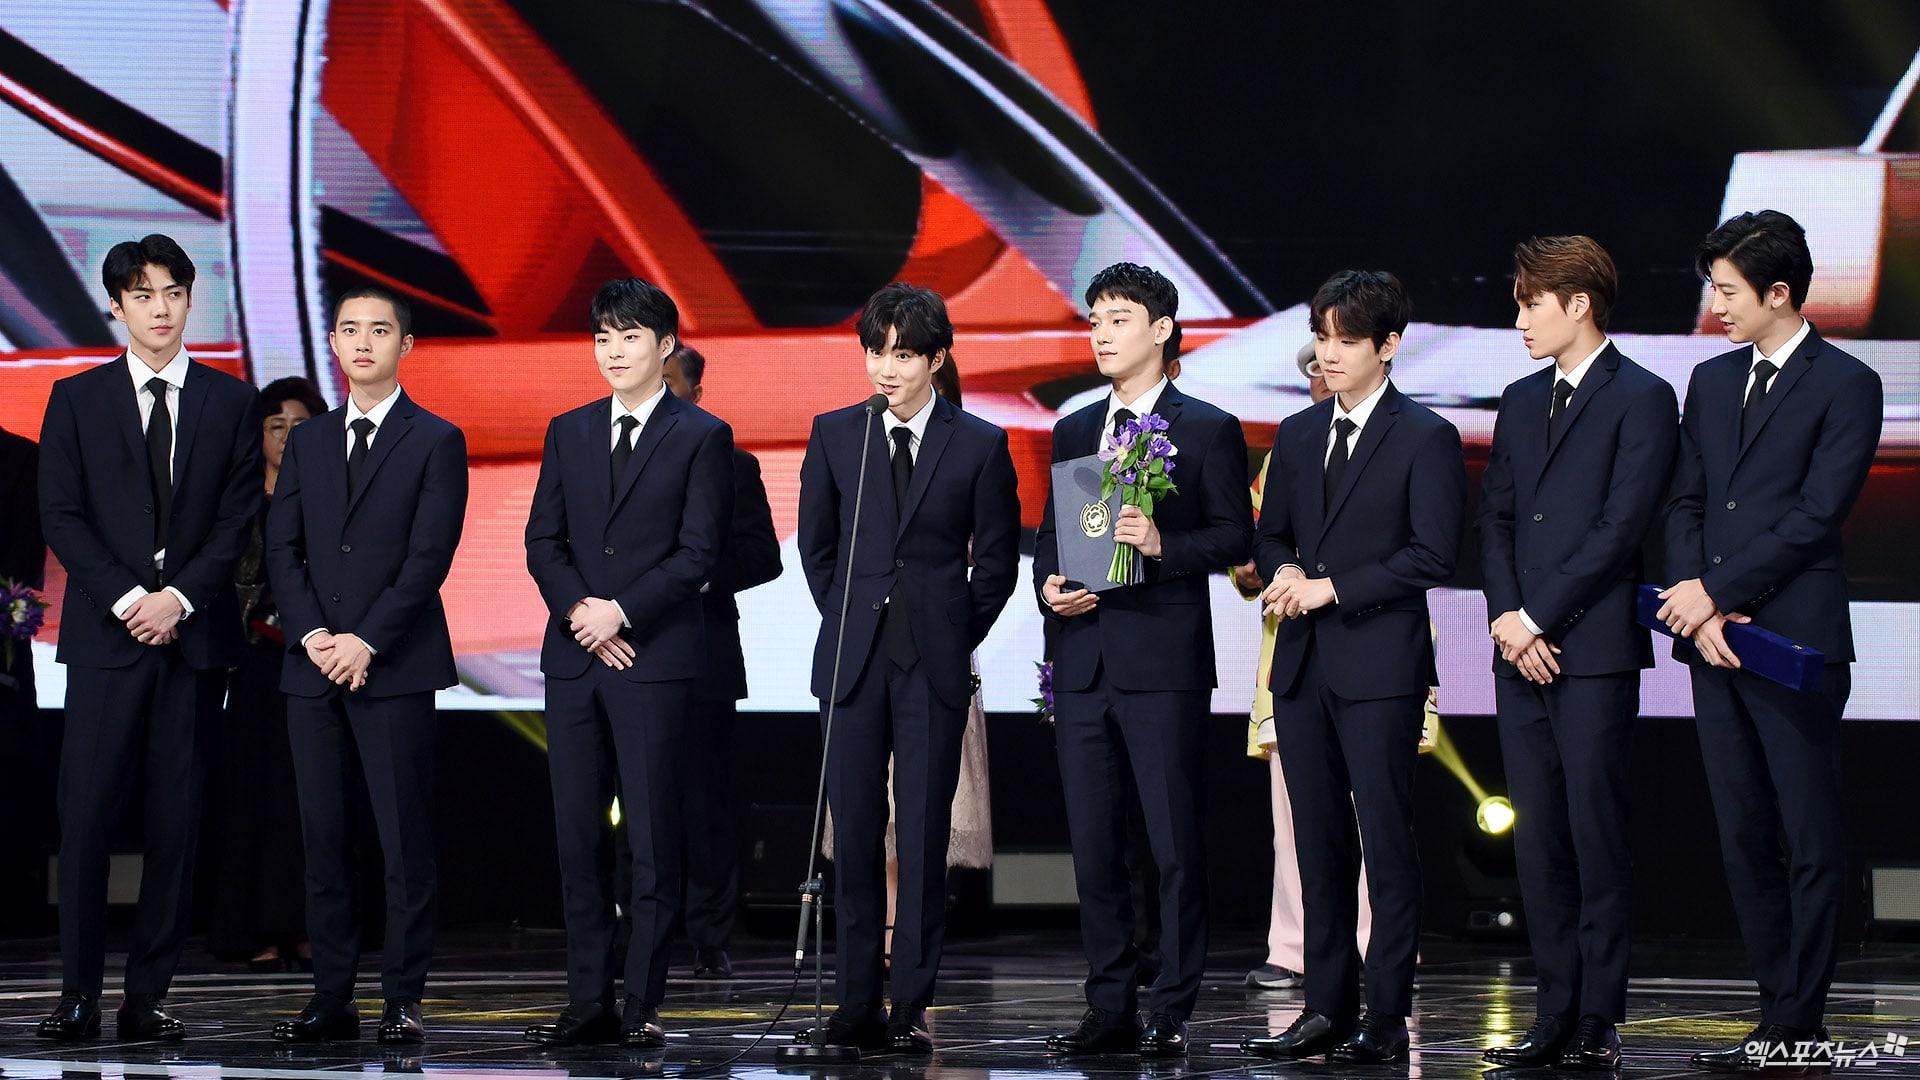 https: img.okeinfo.net content 2017 11 04 33 1808460 exo-park-bo-gum-park-bo-young-raih-penghargaan-di-korean-popular-culture-arts-awards-2017-zcKHMn7ug9.jpg